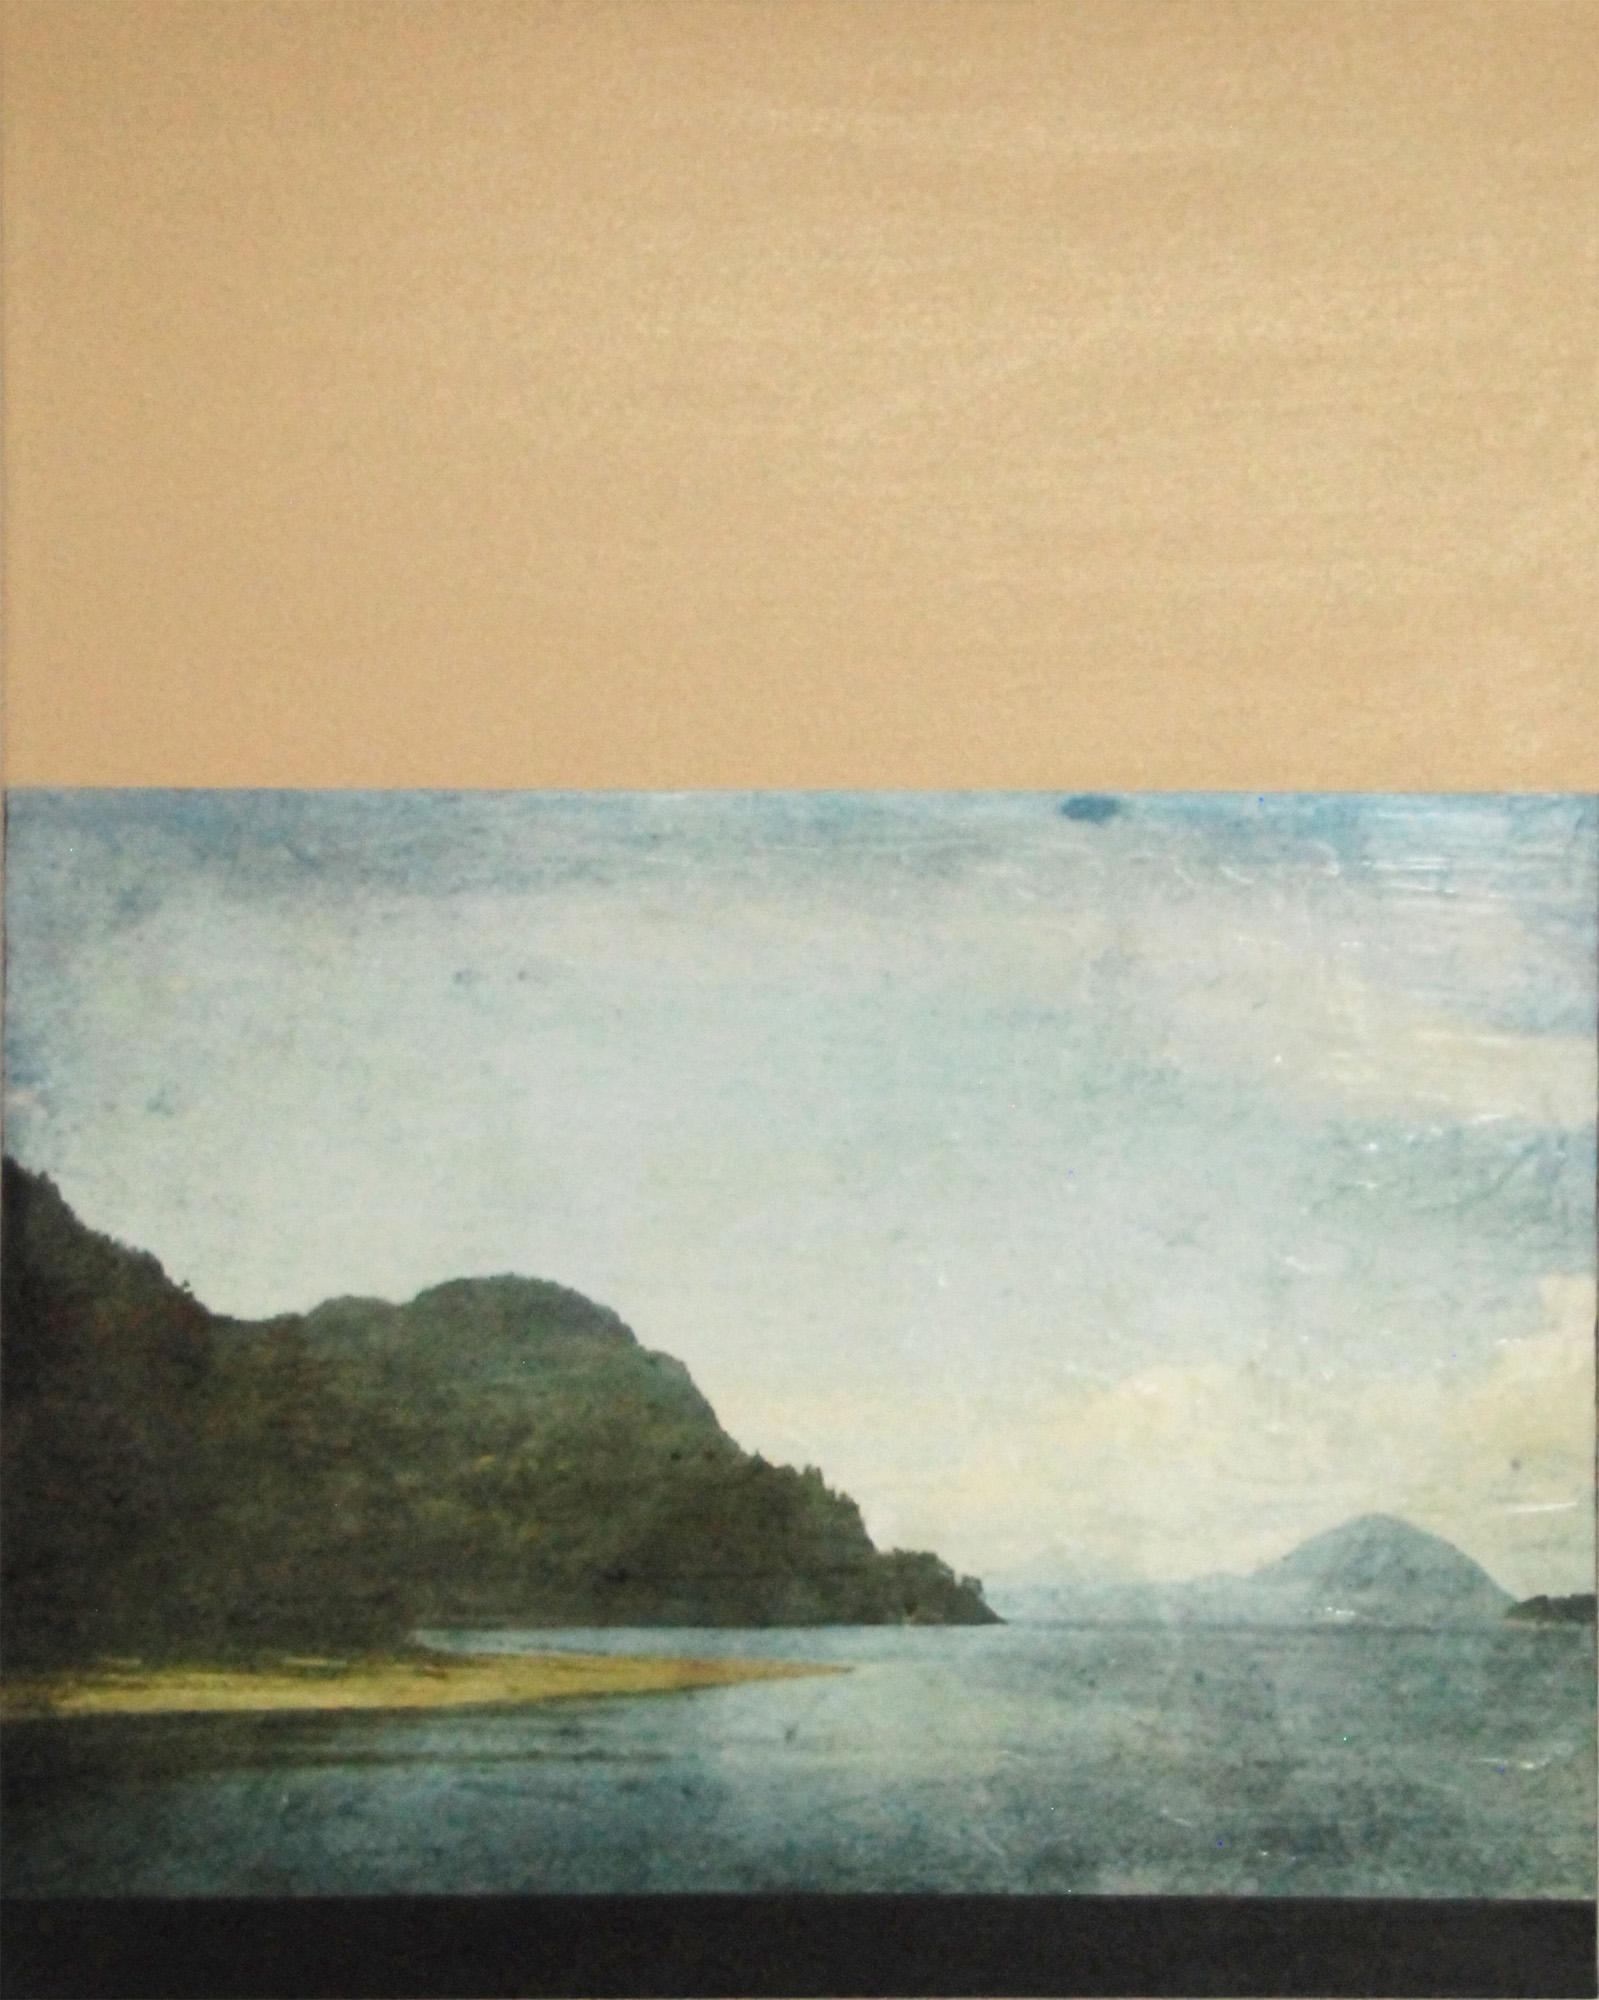 Jocelyn Fisk-Schleger is one of eight artists Exhibiting at Kafka's